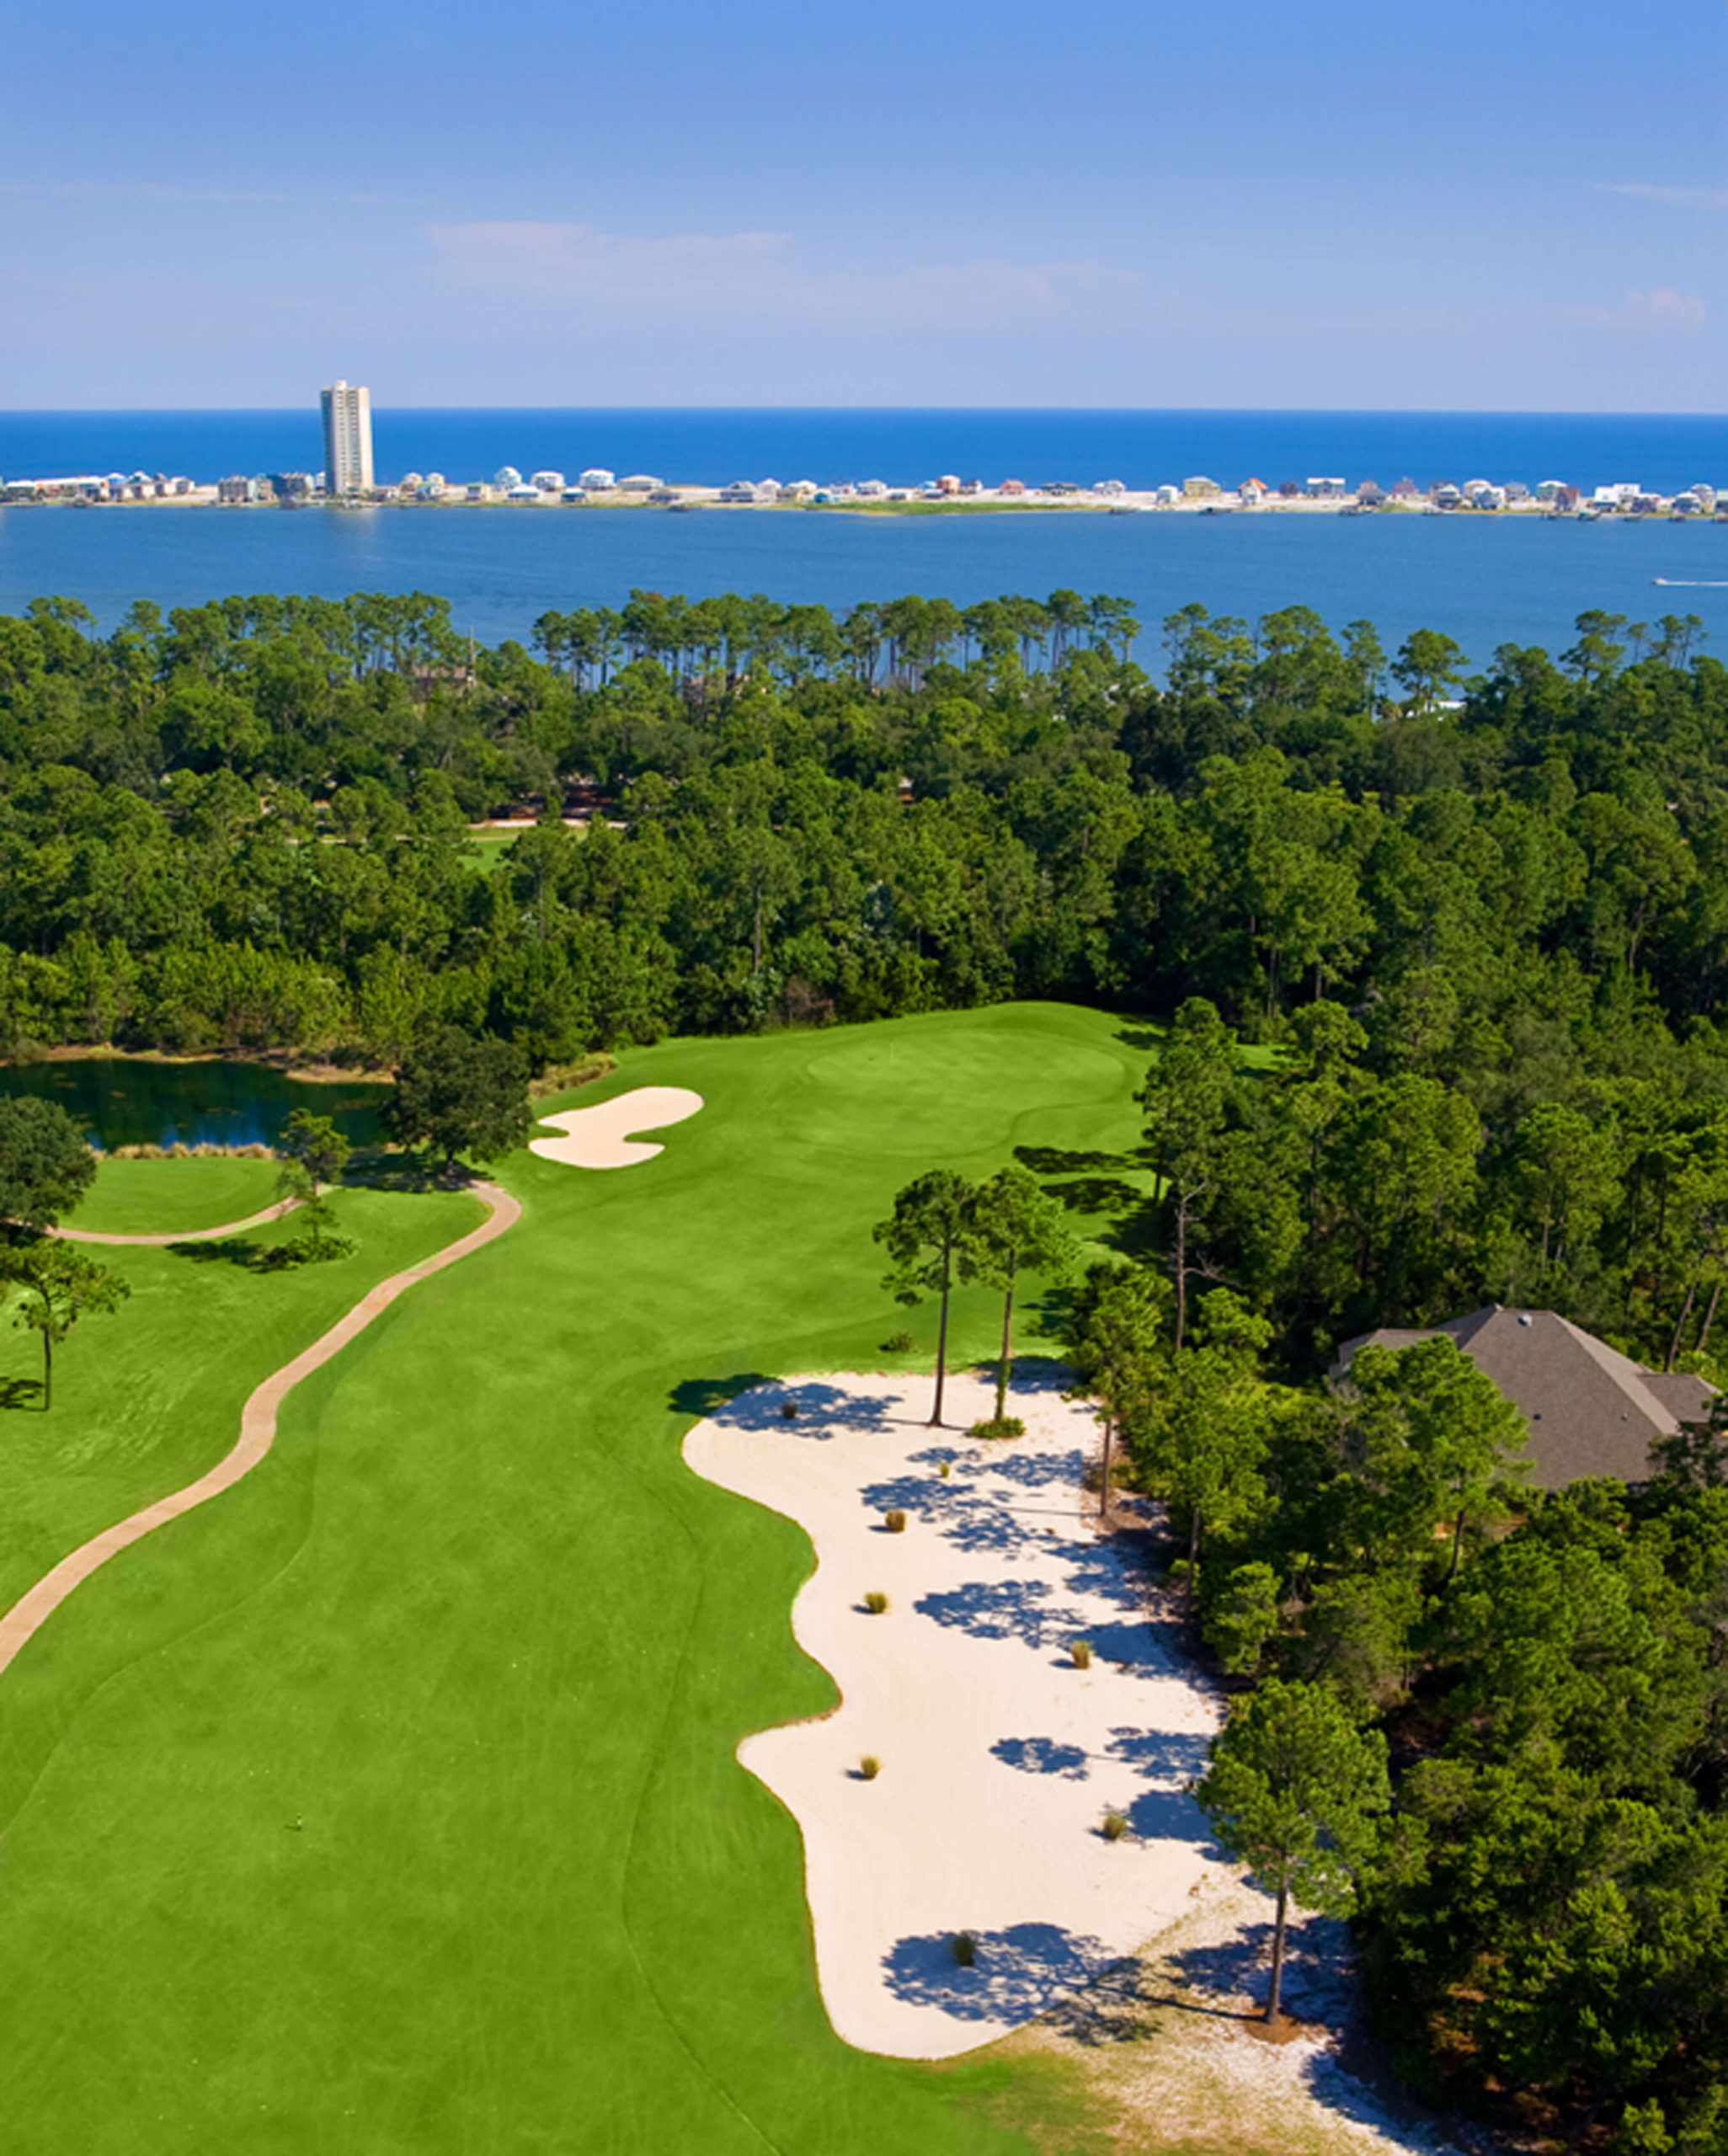 Peninsula Golf Club Gulf Shores Alabama Golf Course